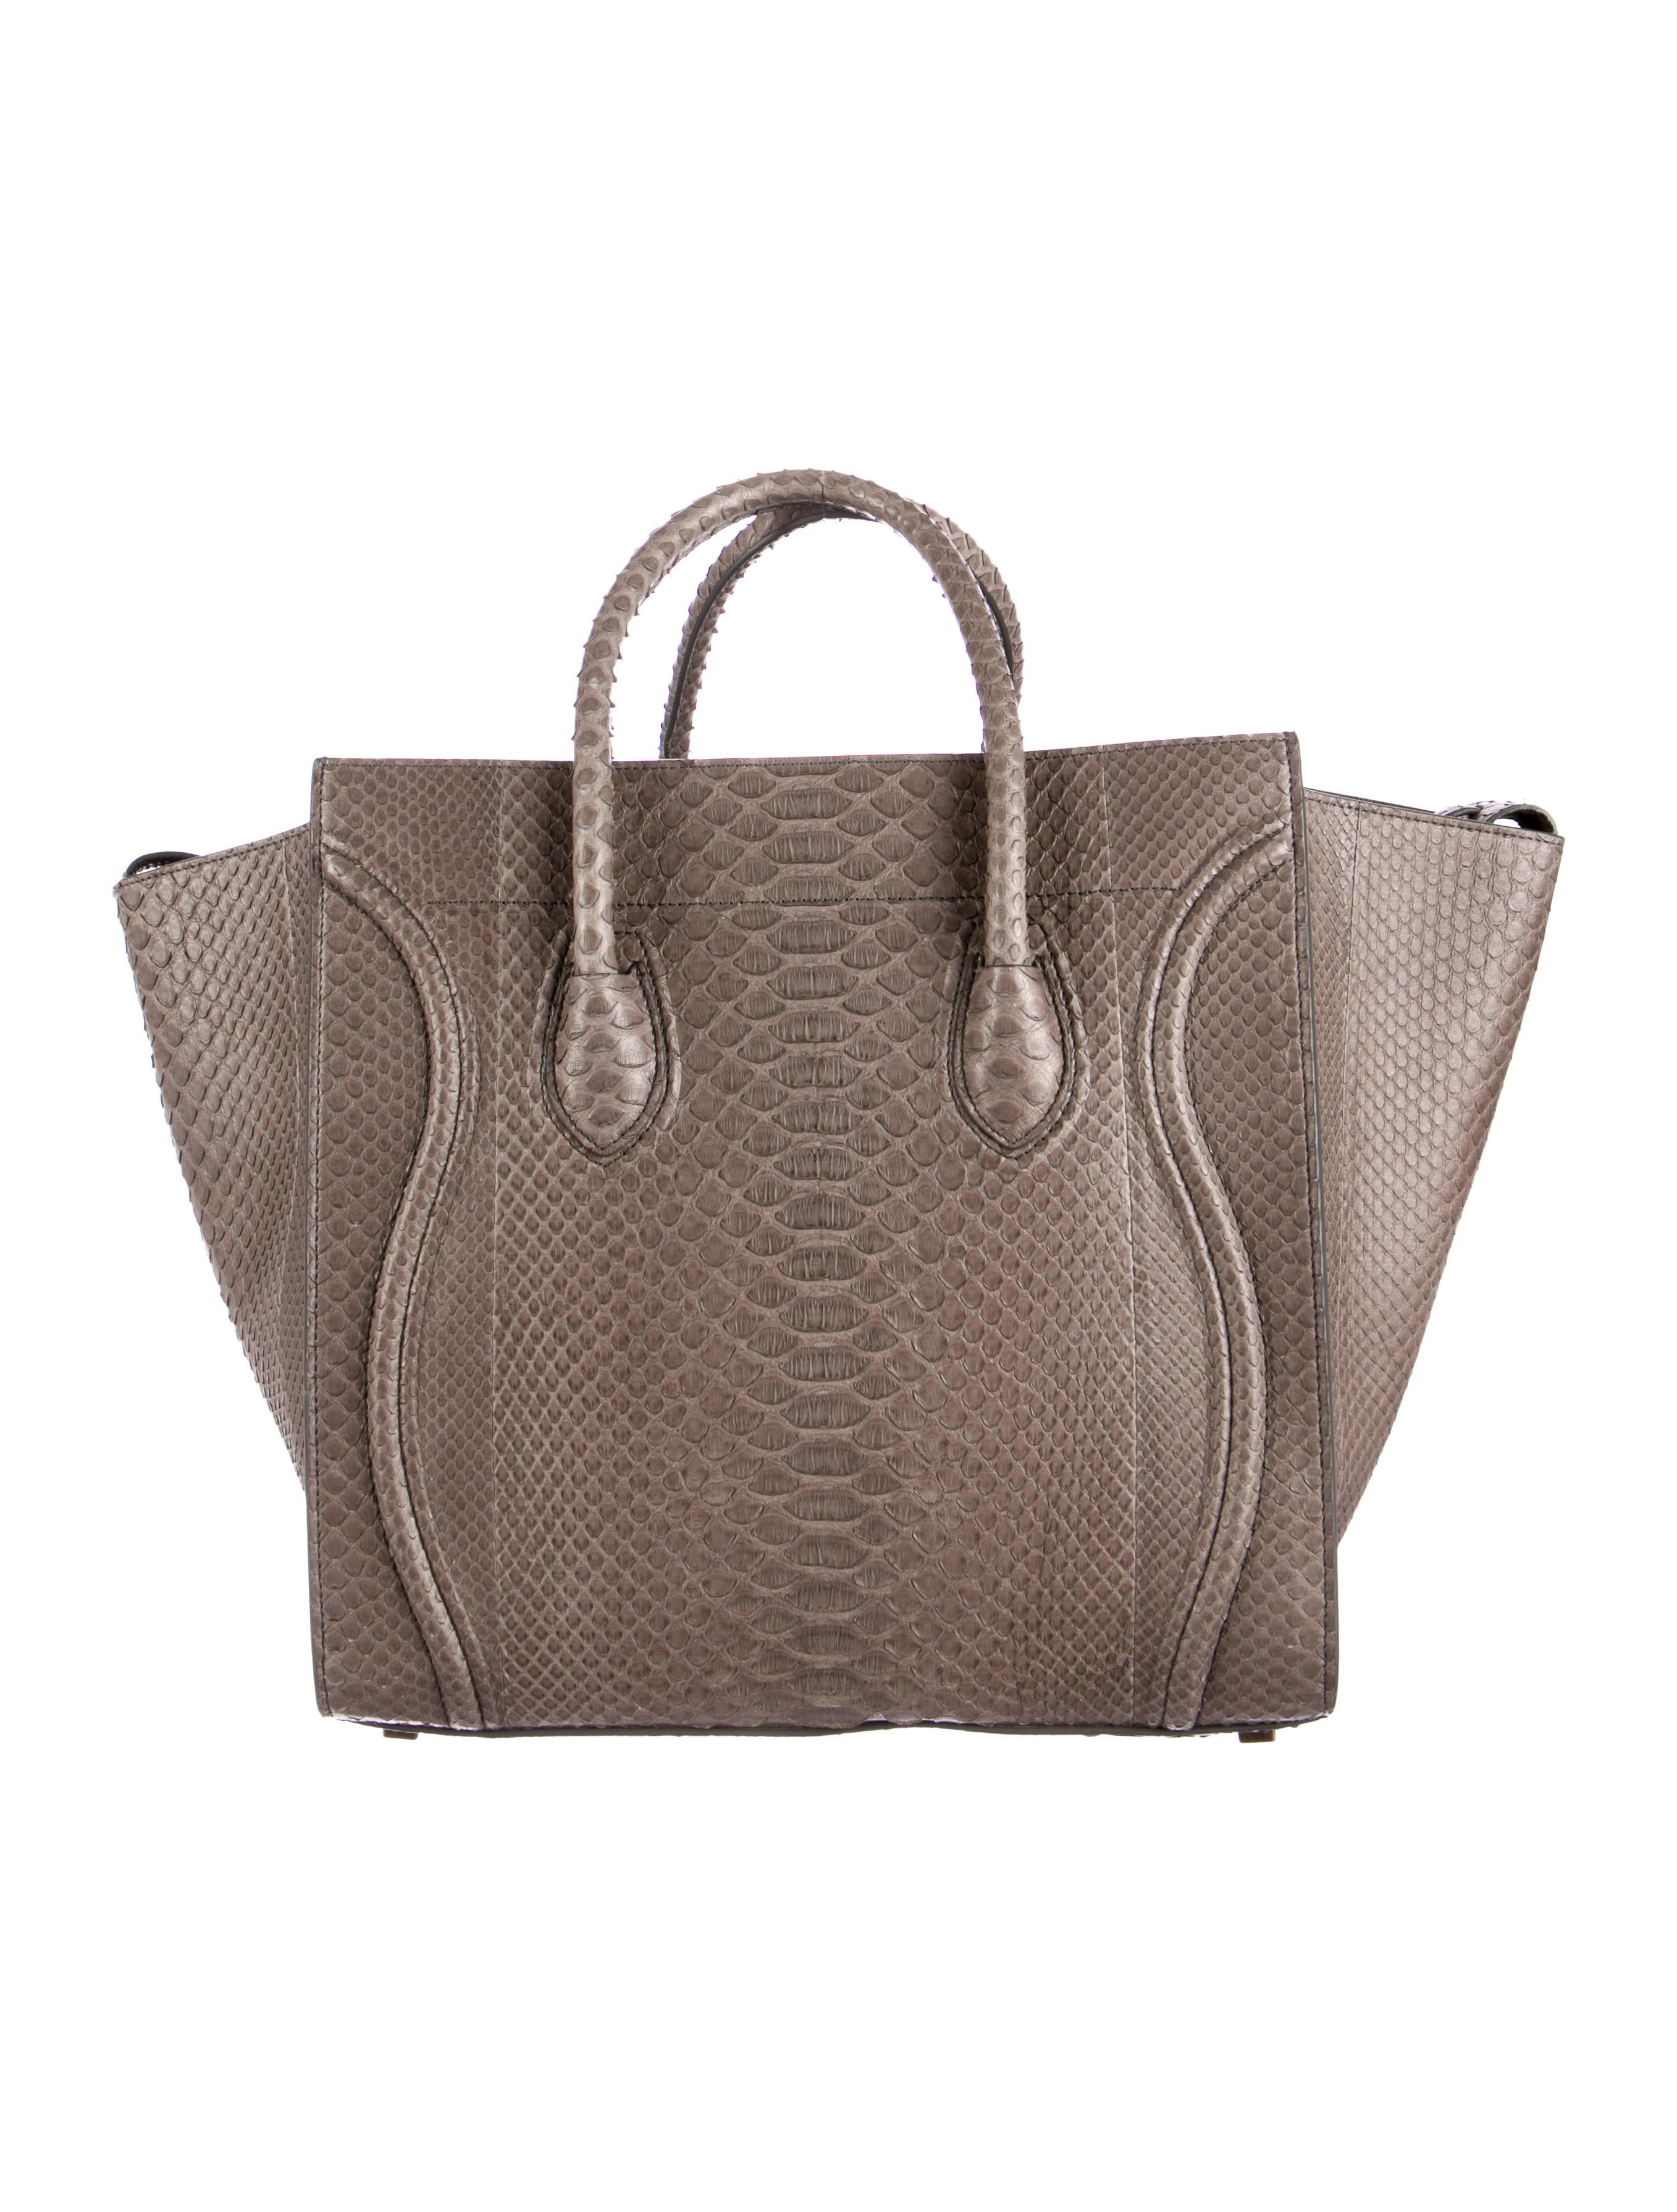 celine classic box bag black - celine medium python phantom tote, celine luggage bag replica